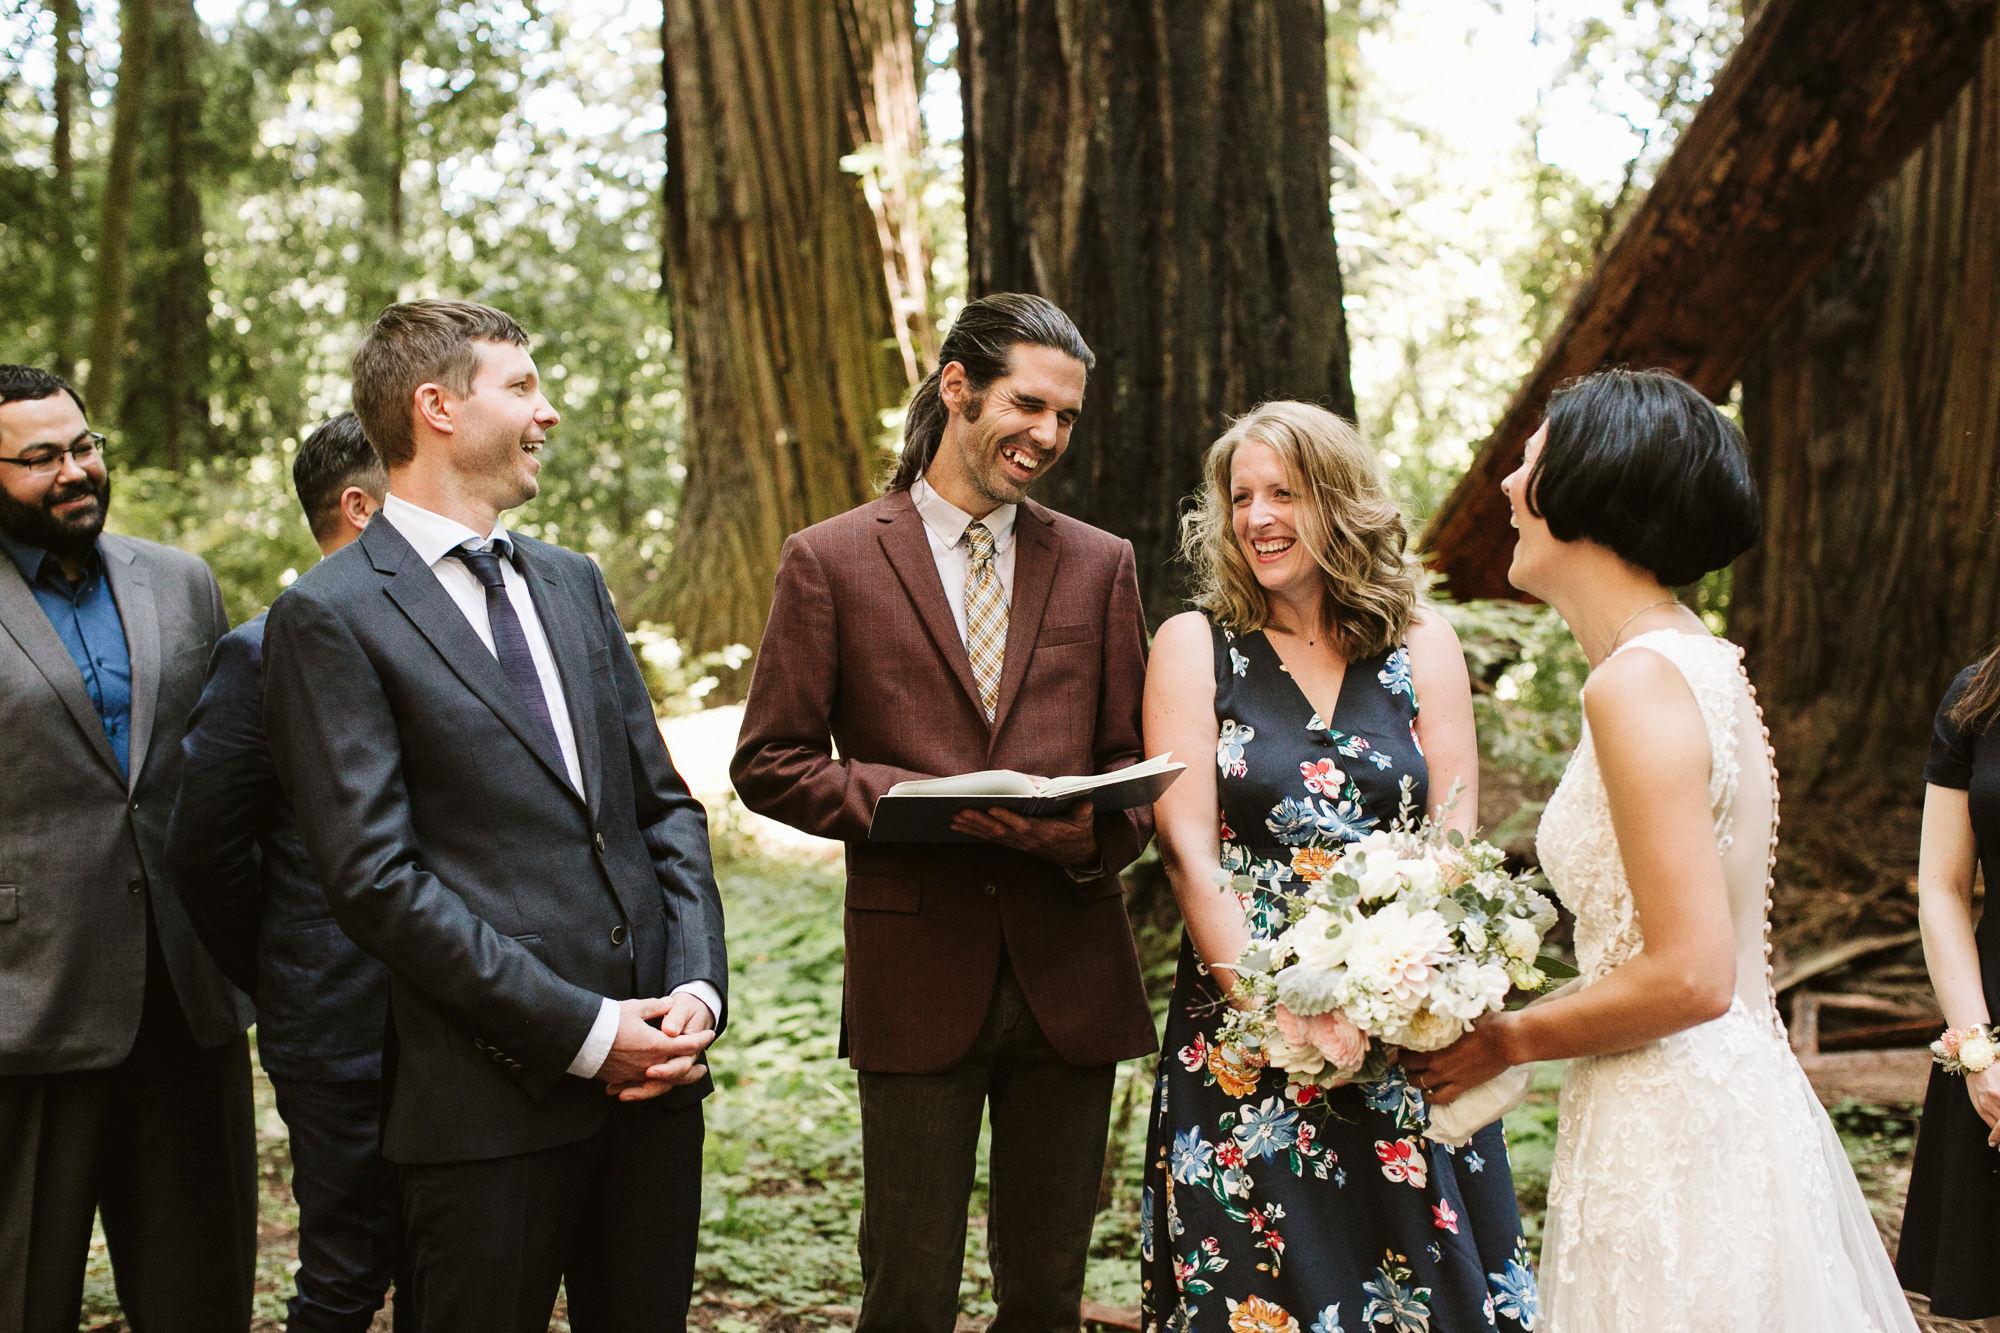 California-wedding-photographer-alfonso-flores-pamplin-groove-187.jpg